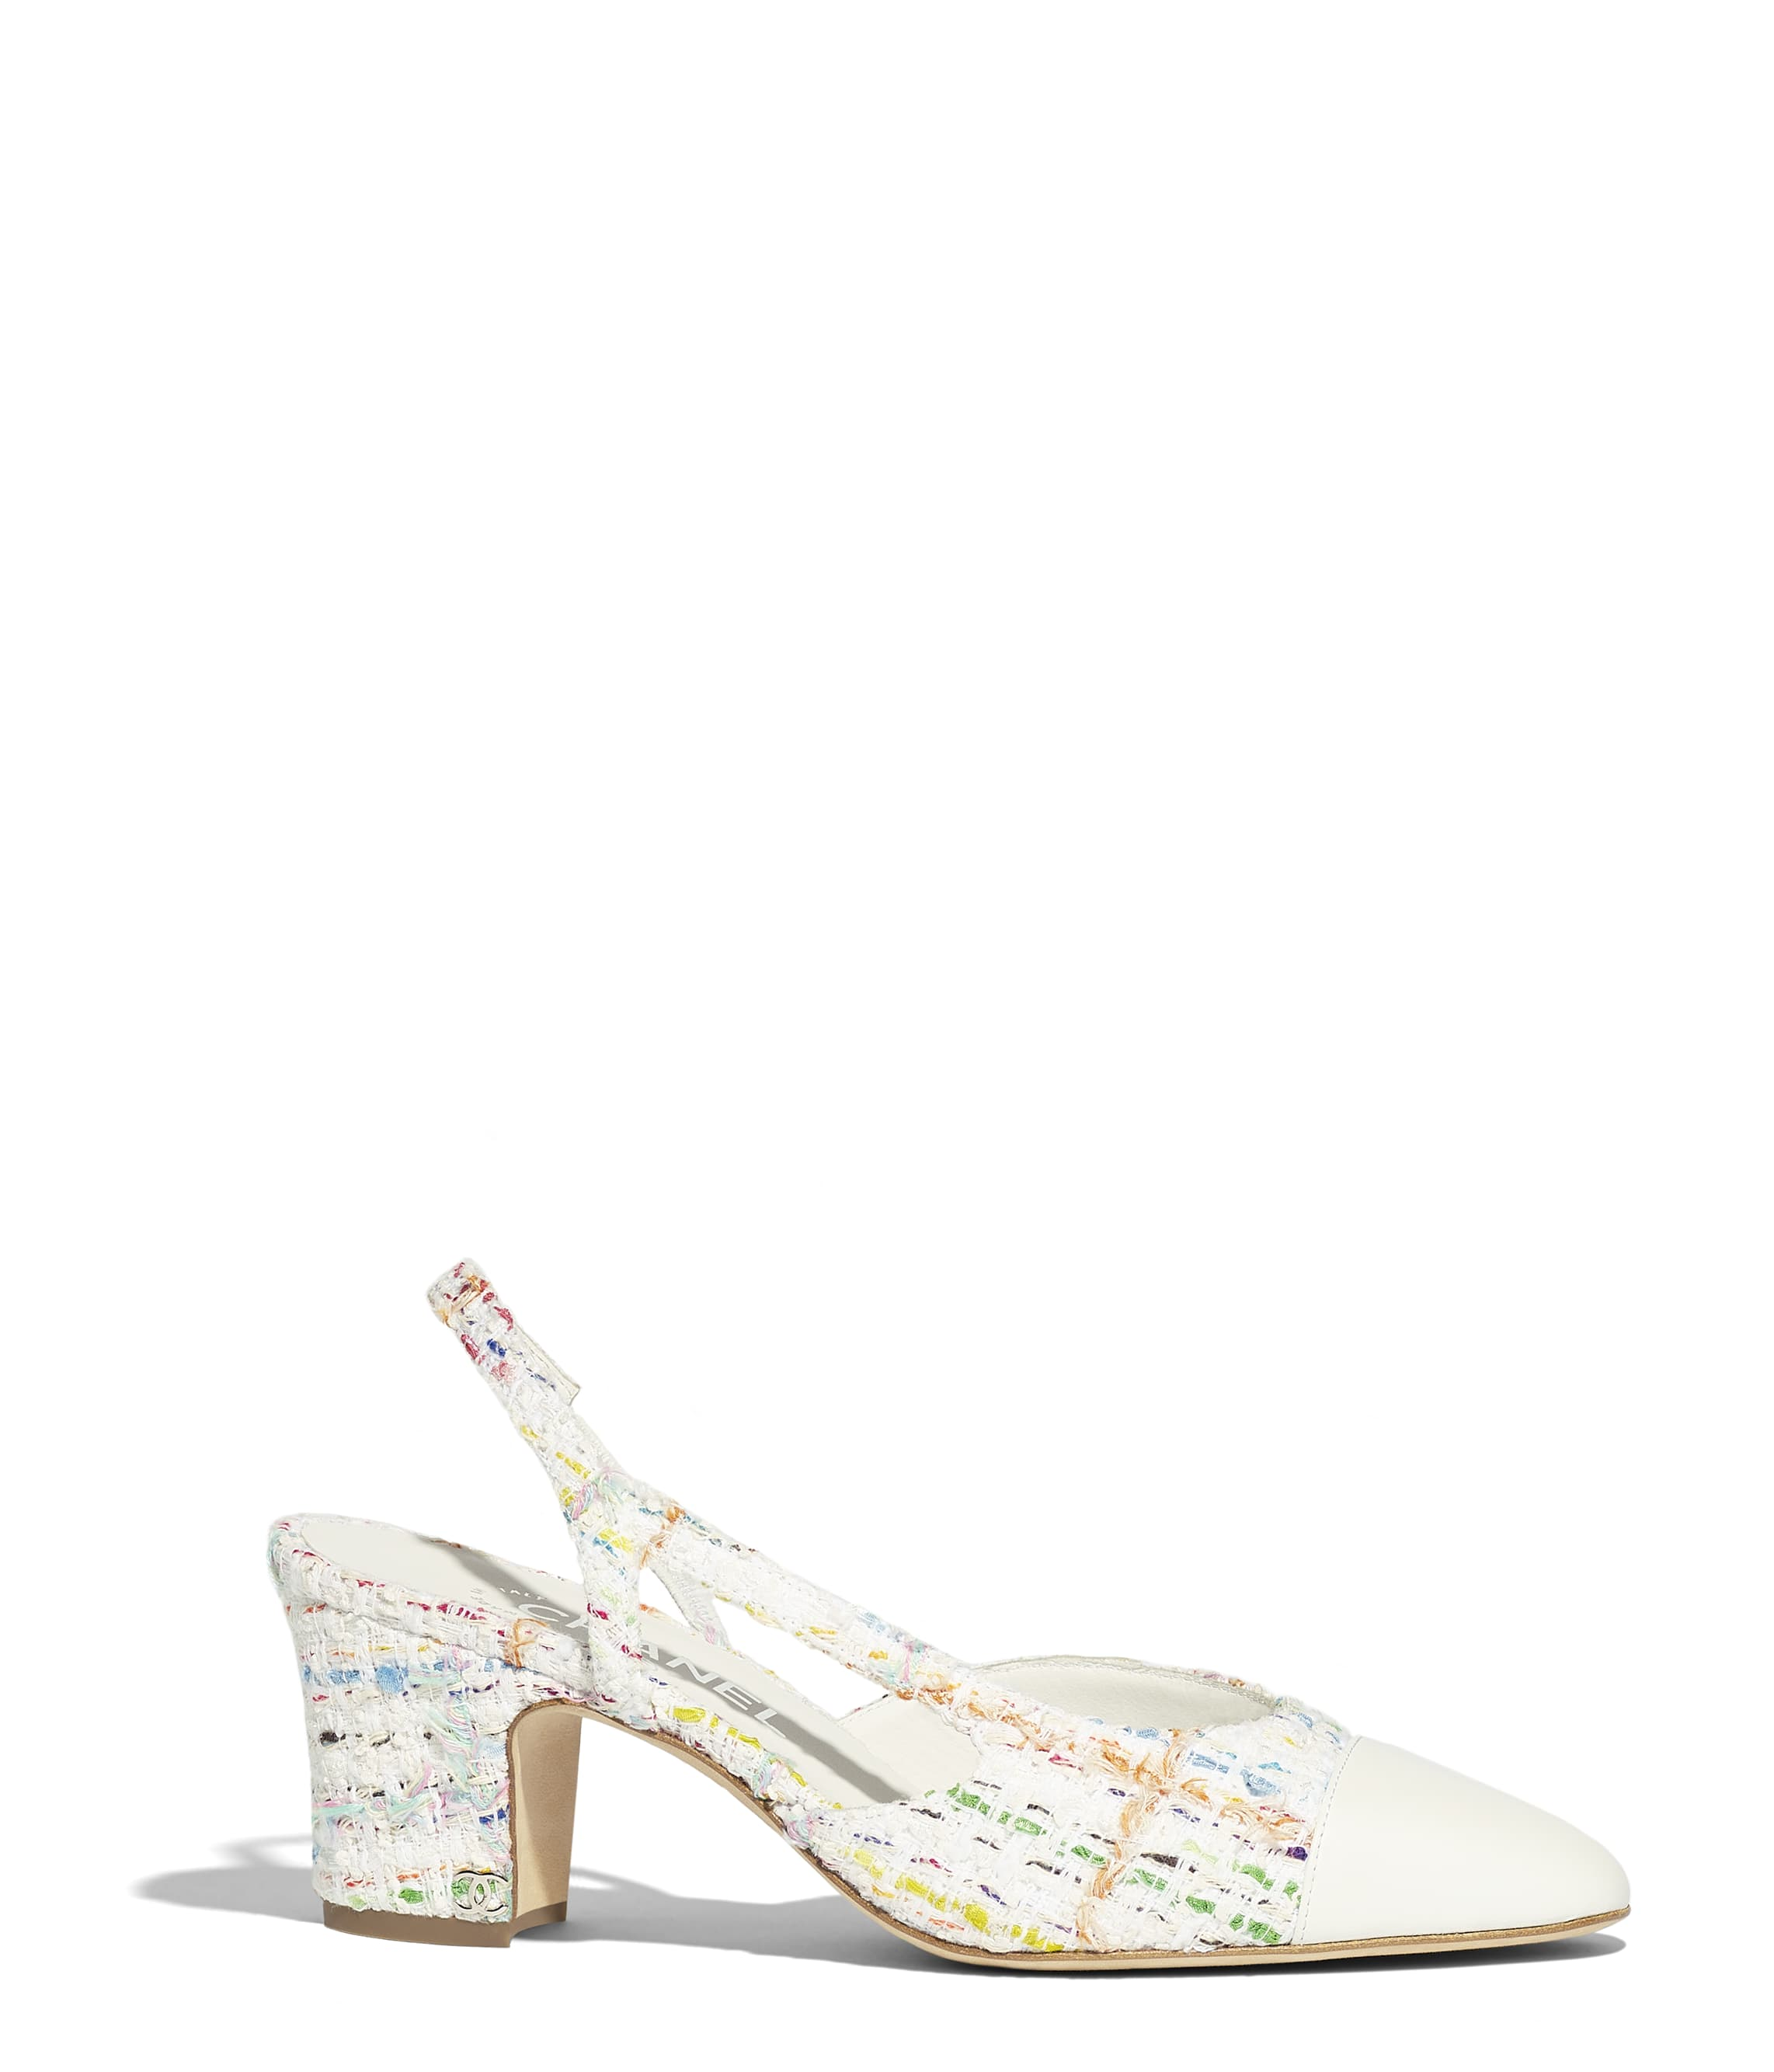 acef2c81b17 Pumps   Slingbacks - Shoes - CHANEL